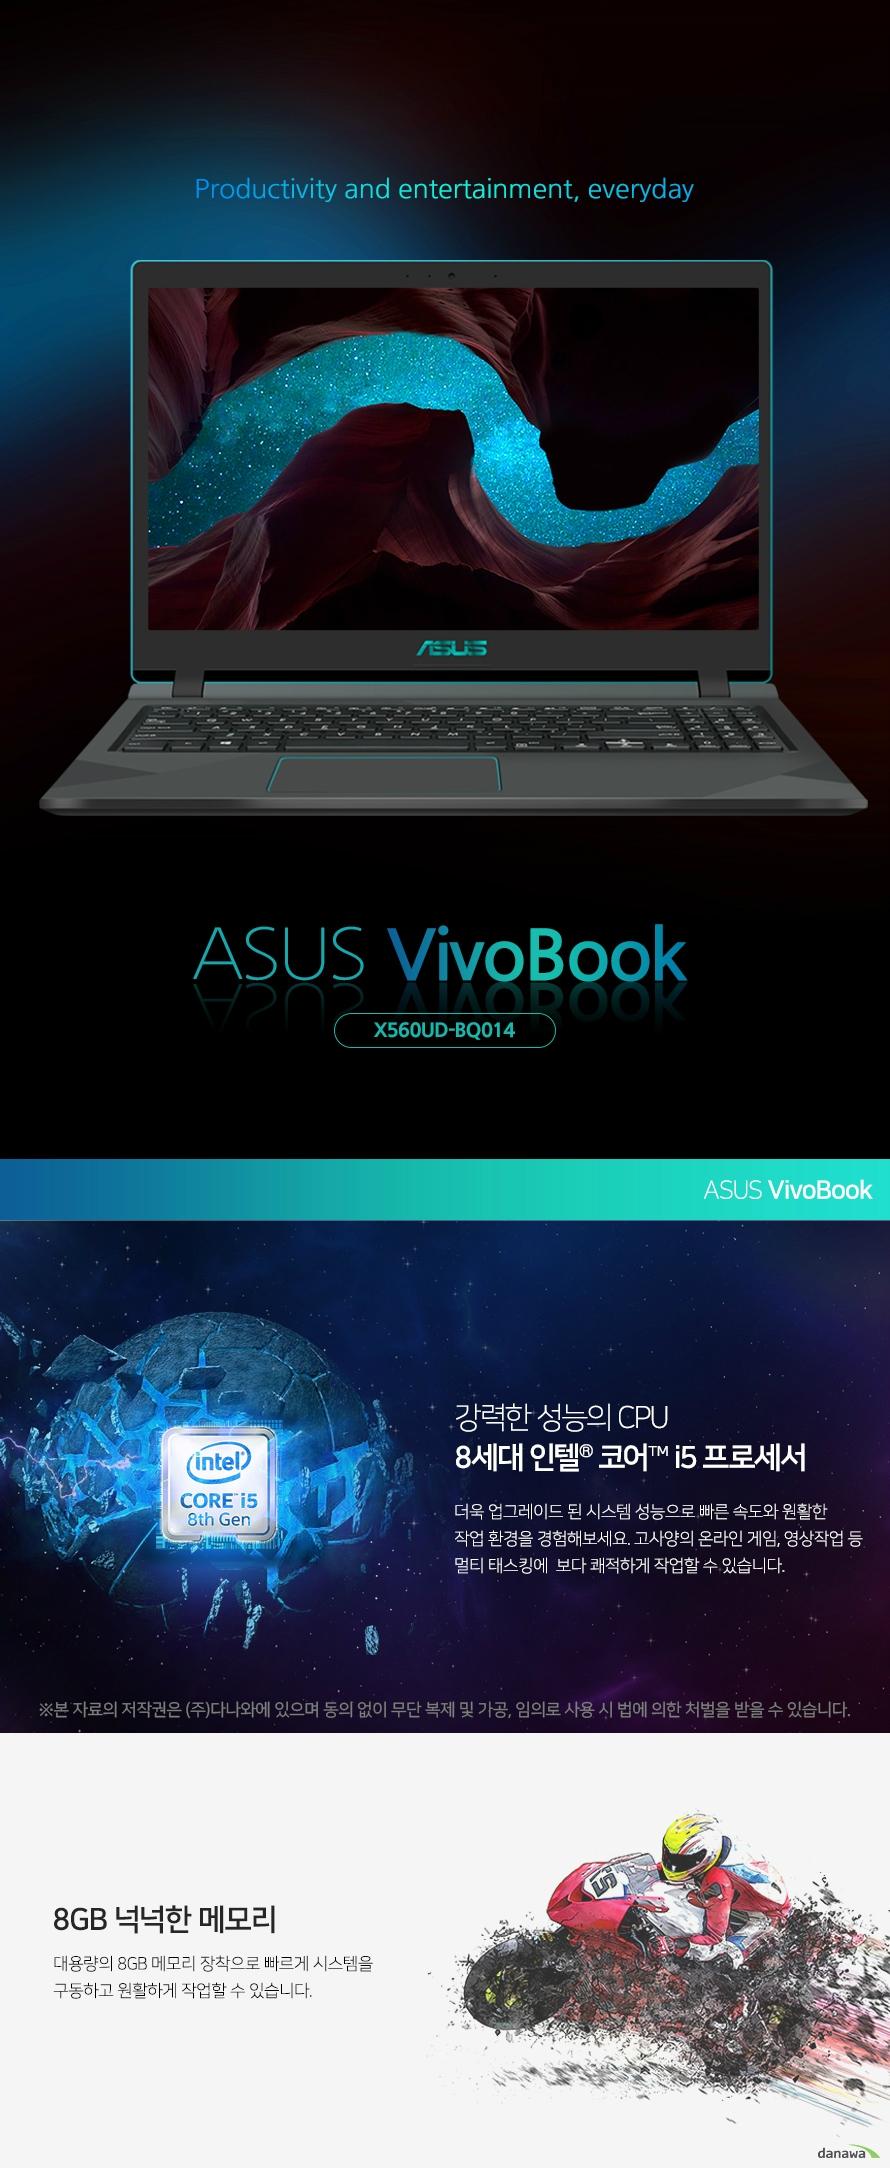 Productivity and entertainment, everyday asus vivobook  강력한 성능의 CPU 8세대 인텔 코어 i5 프로세서 더욱 업그레이드 된 시스템 성능으로 빠른 속도와 원활한 작업 환경을 경험해보세요. 고사양의 온라인 게임, 영상작업 등  멀티 태스킹에  보다 쾌적하게 작업할 수 있습니다. 대용량의 넉넉한 메모리    대용량의 메모리 장착으로 빠르게 시스템을  구동하고 원활하게 작업할 수 있습니다.       차원이 다른 그래픽 외장그래픽카드 장착  외장 그래픽카드 장착으로 고해상도의 그래픽을 경험해보세요. 선명하고 생생한 그래픽으로 영상 재생, 작업등을 원활하게 할 수 있습니다.  넓어진 시야, 탁월한 색 재현 NanoEdge 디스플레이    양 측면의 베젤을 한층 최소한으로 줄인 NanoEdge 디스플레이로 넓게 트인 시야와 탁월한 색 재현을 통해, 색 왜곡이 없고 깨끗한 화면을 보여줍니다.        생생하고 실감나는 사운드 ASUS SonicMaster    전문적인 수준의 정밀한 오디오, 노이즈 필터링 등이 조합된 ASUS Sonic Master 기술을 탑재한 노트북으로 몰입감 있는 생생하고 실감나는 사운드 경험할 수 있습니다. 뛰어난 쿨링성능 ASUS IceCool 기술    ASUS IceCool 기술은 스마트한 팬 컨트롤, 얇은  히트 파이프 및 영리한 엔지니어링으로 효율적인  냉각 시스템으로 노트북을 시원하게 유지시켜줍니다.